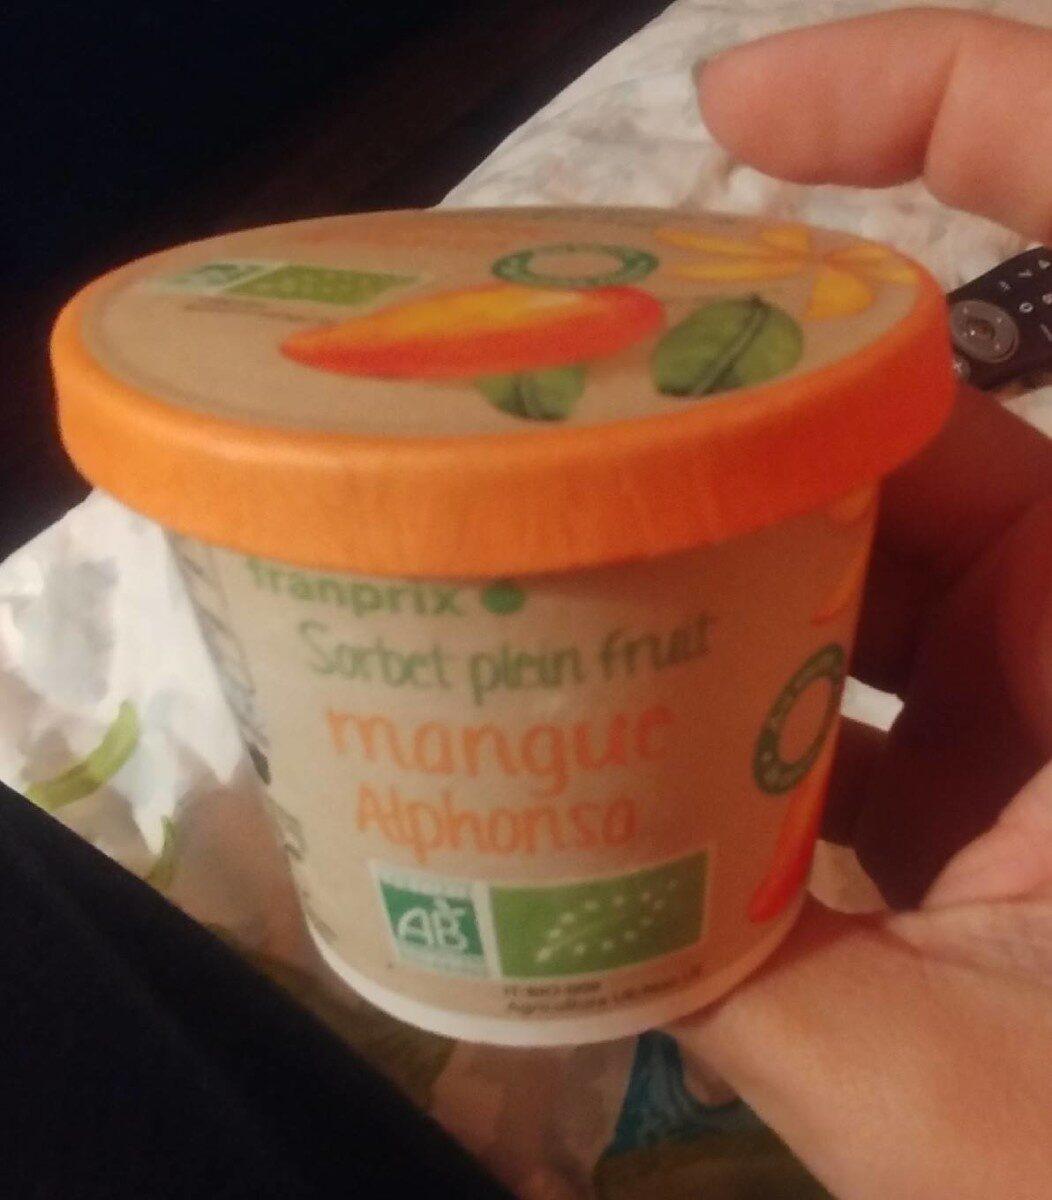 Sorbet plein fruit Mangue Alphonso - Product - fr